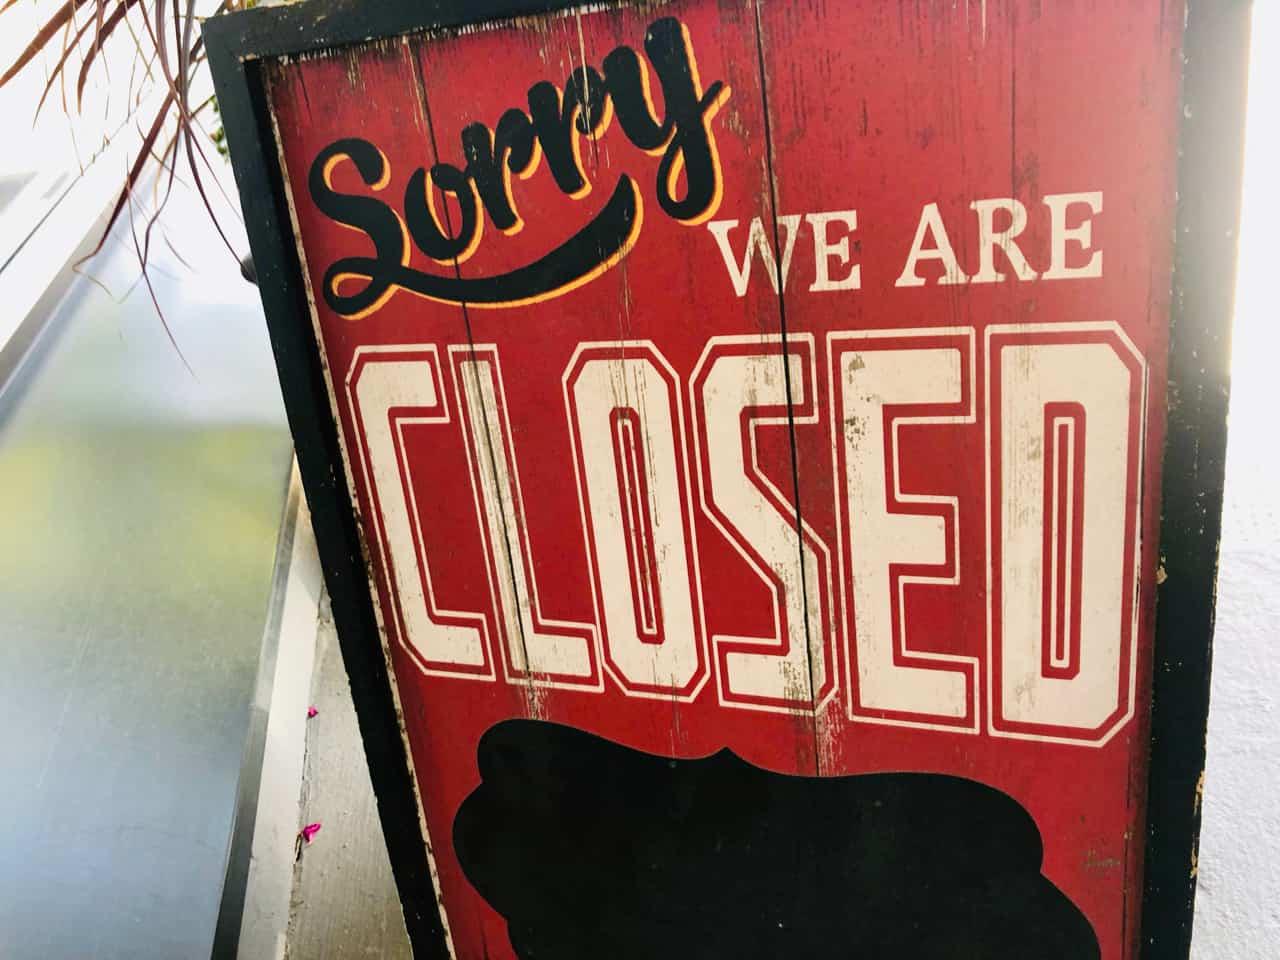 Report: Embattled ICO-Issuer Kik Closing Down Messaging App